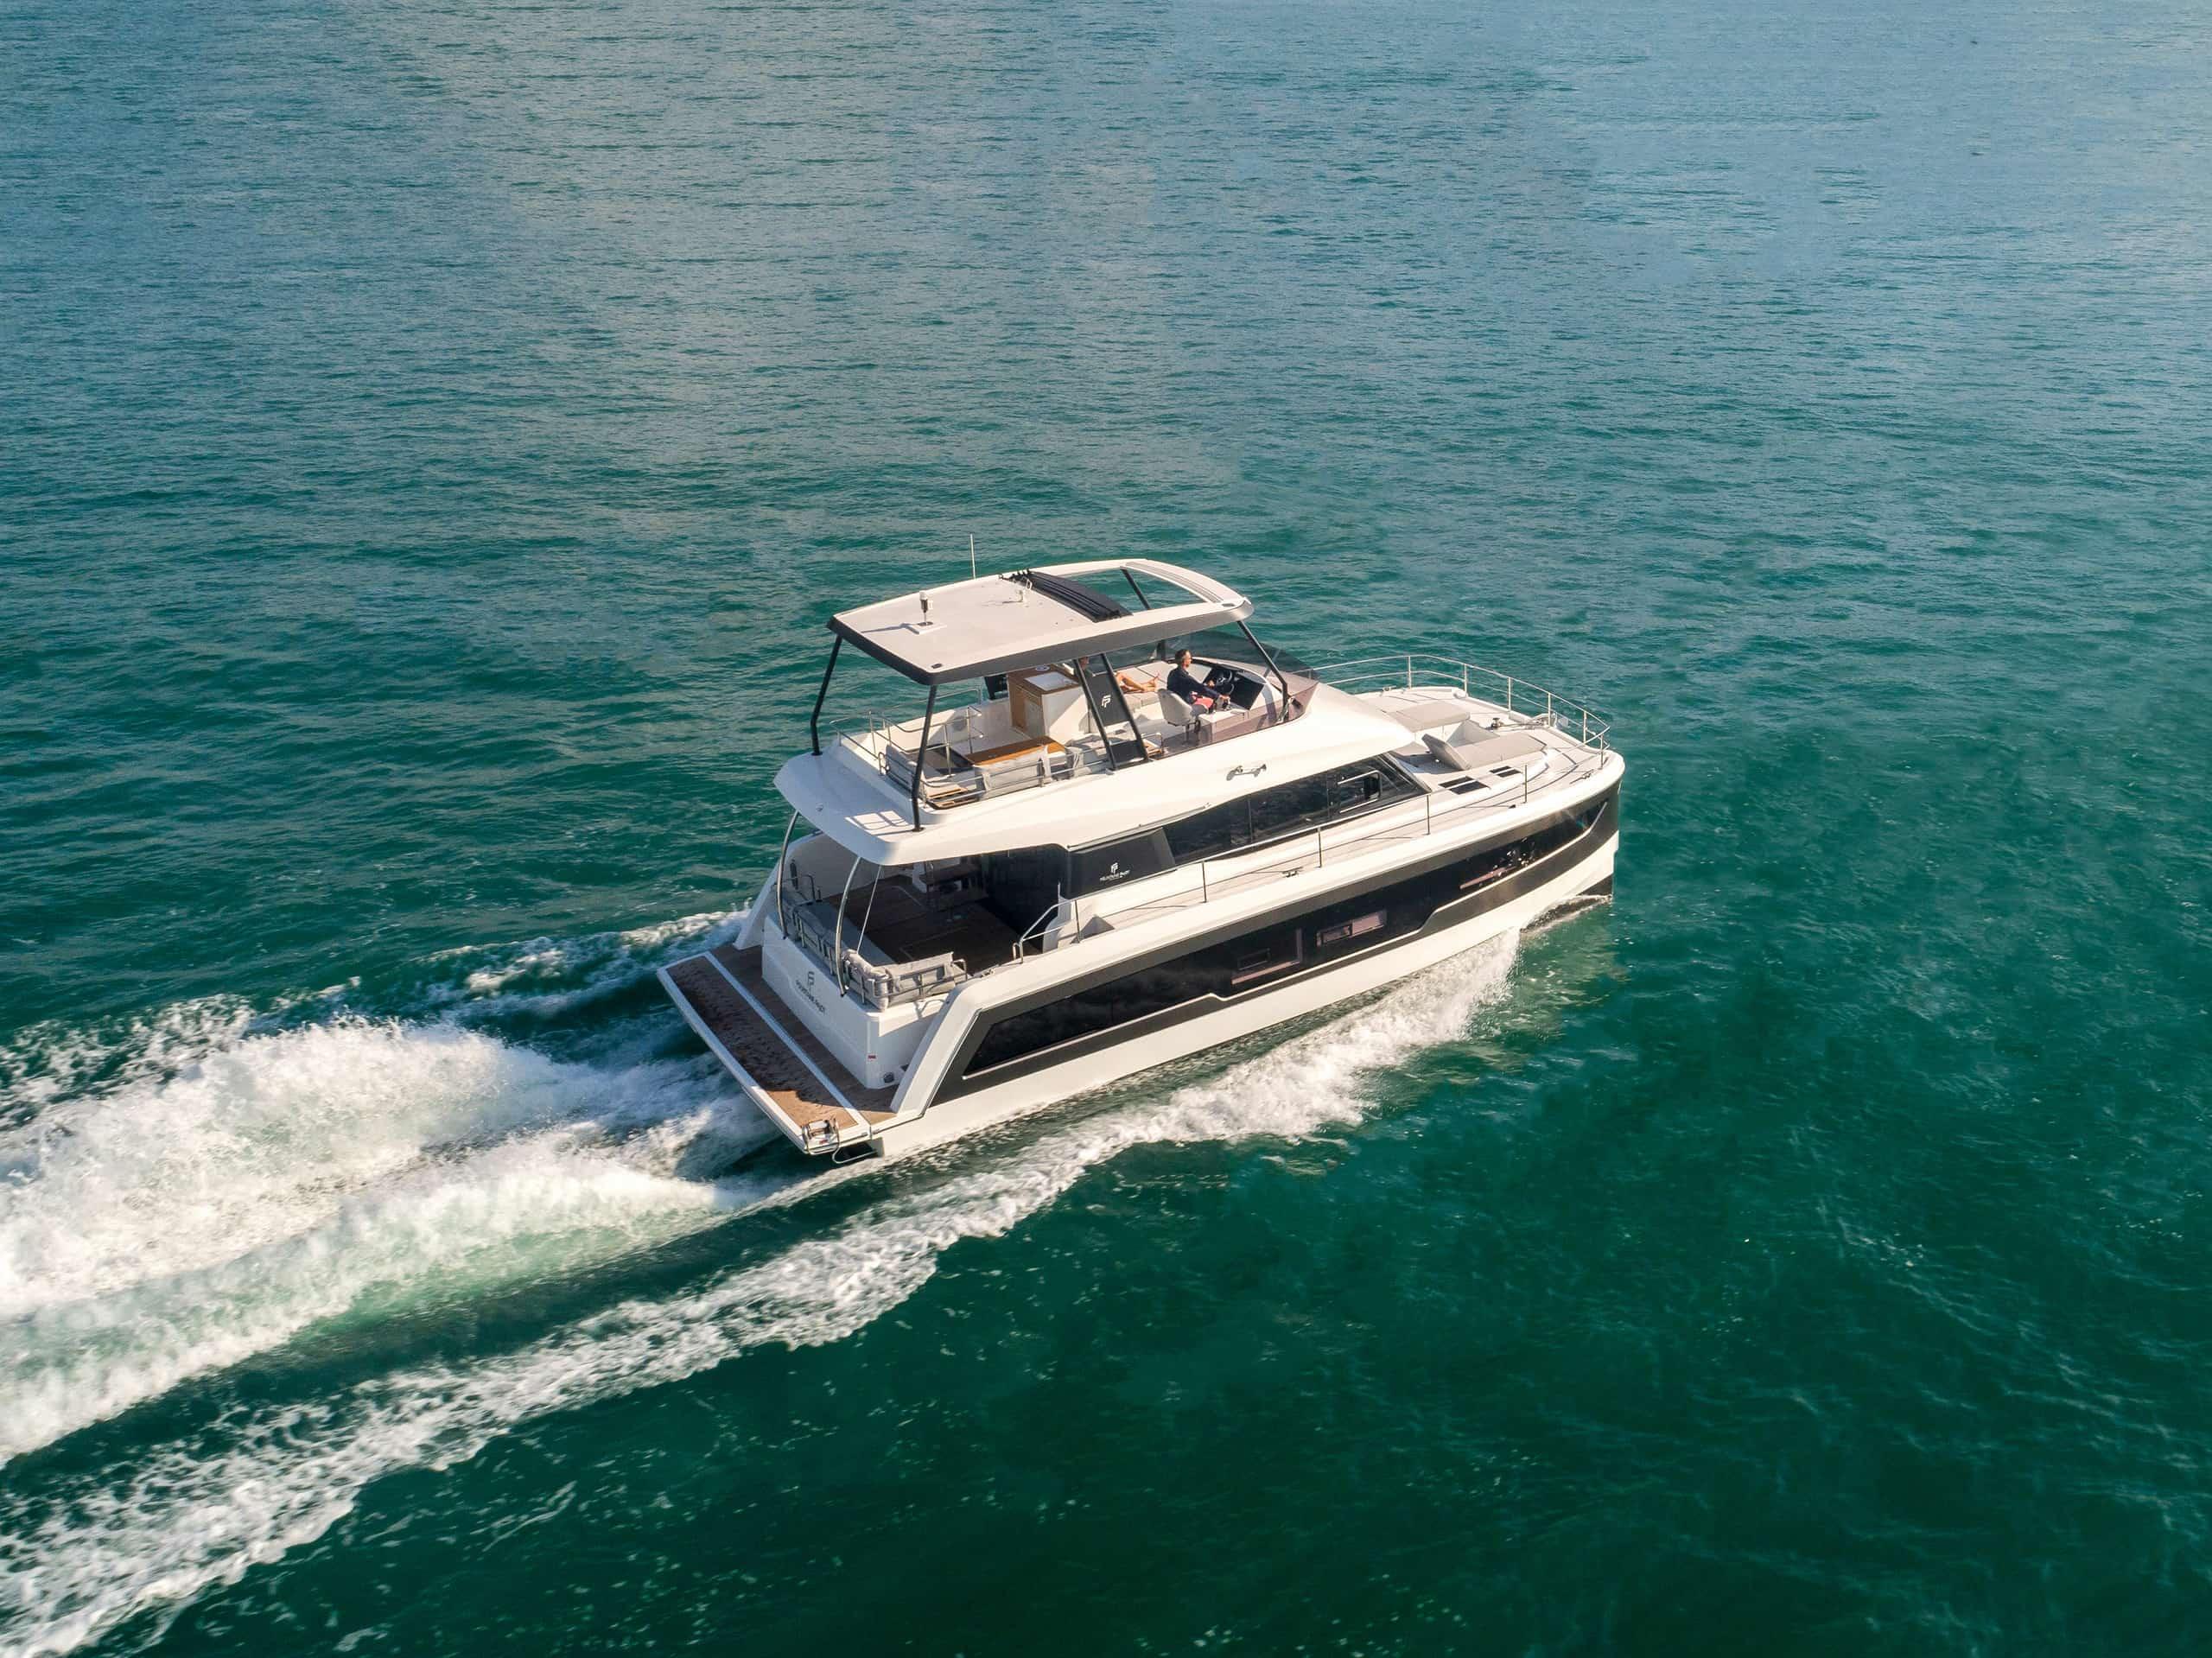 A powered catamaran on an open body of water